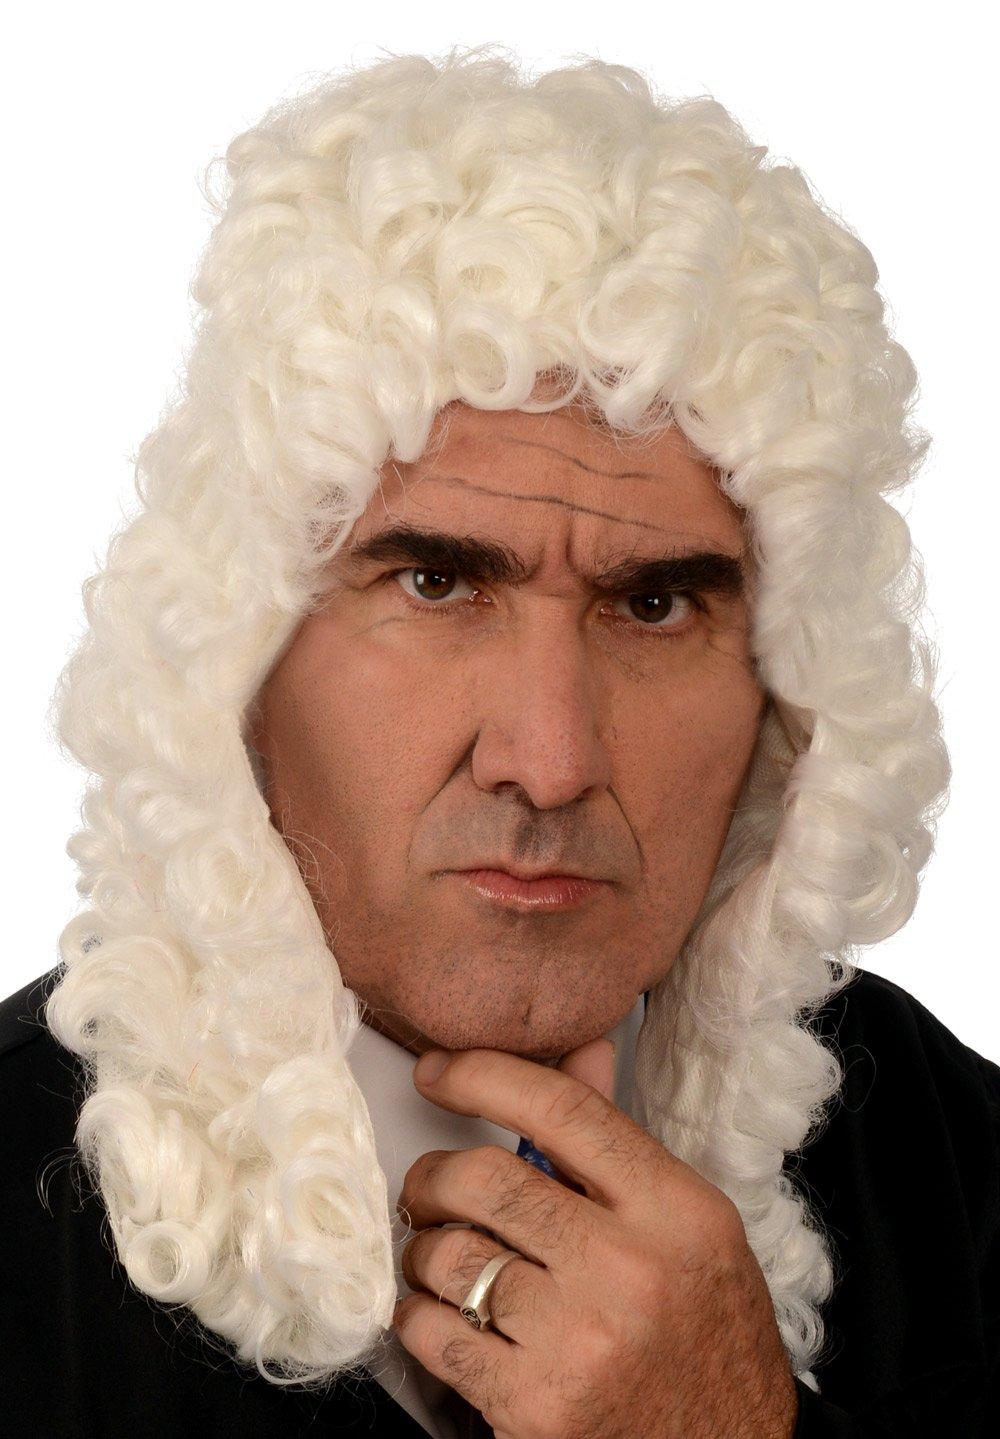 Kangaroo Costume Wigs - Colonial Judge Wig; White